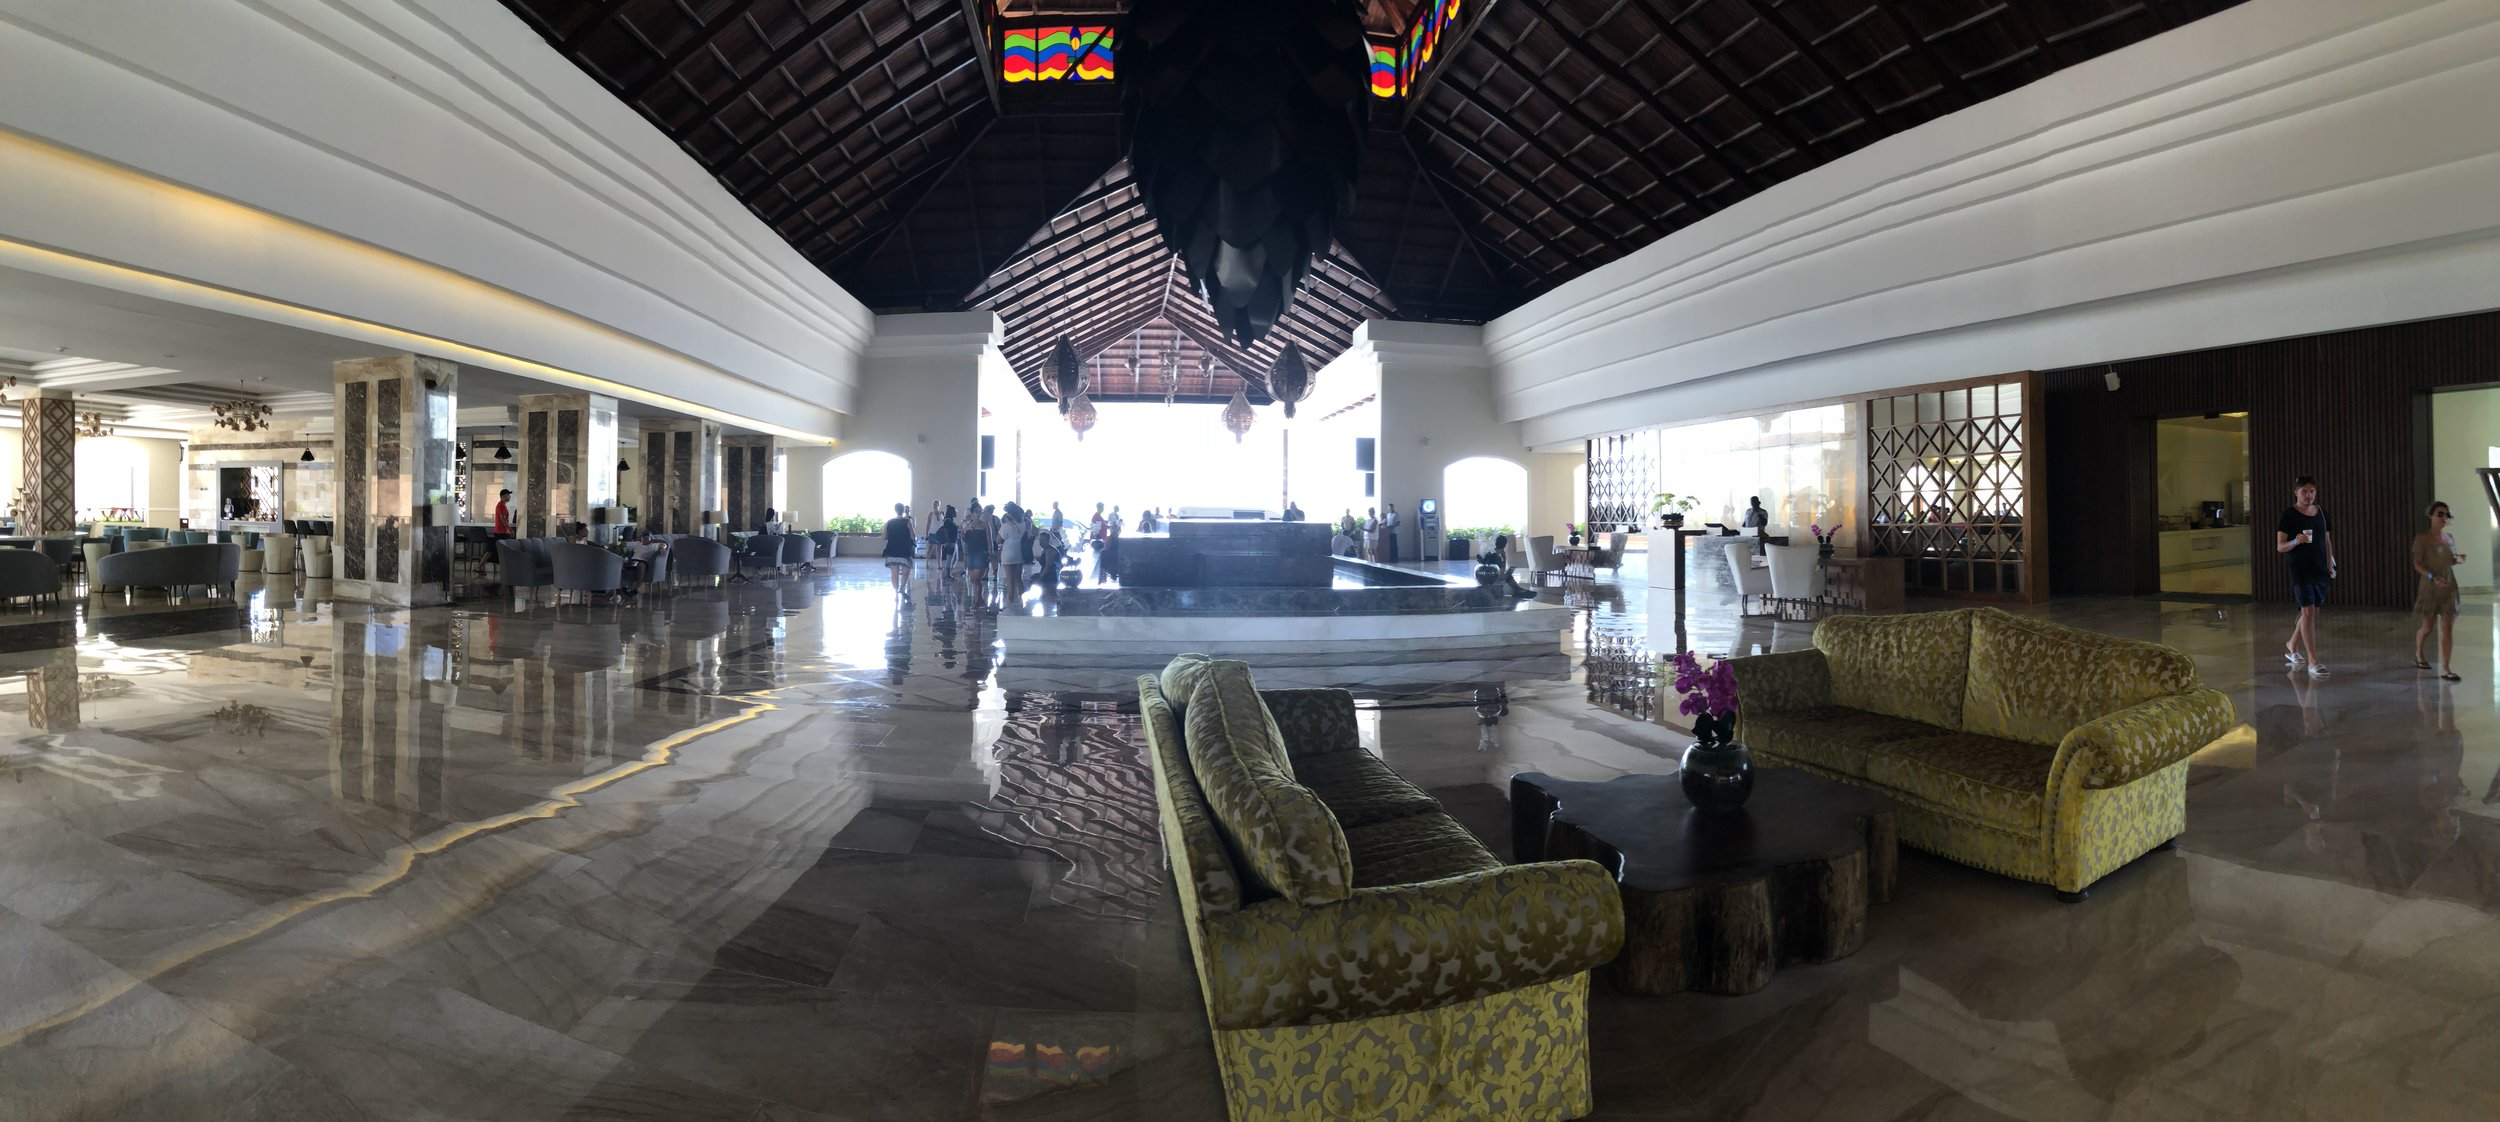 Mirage main lobby, upper level.